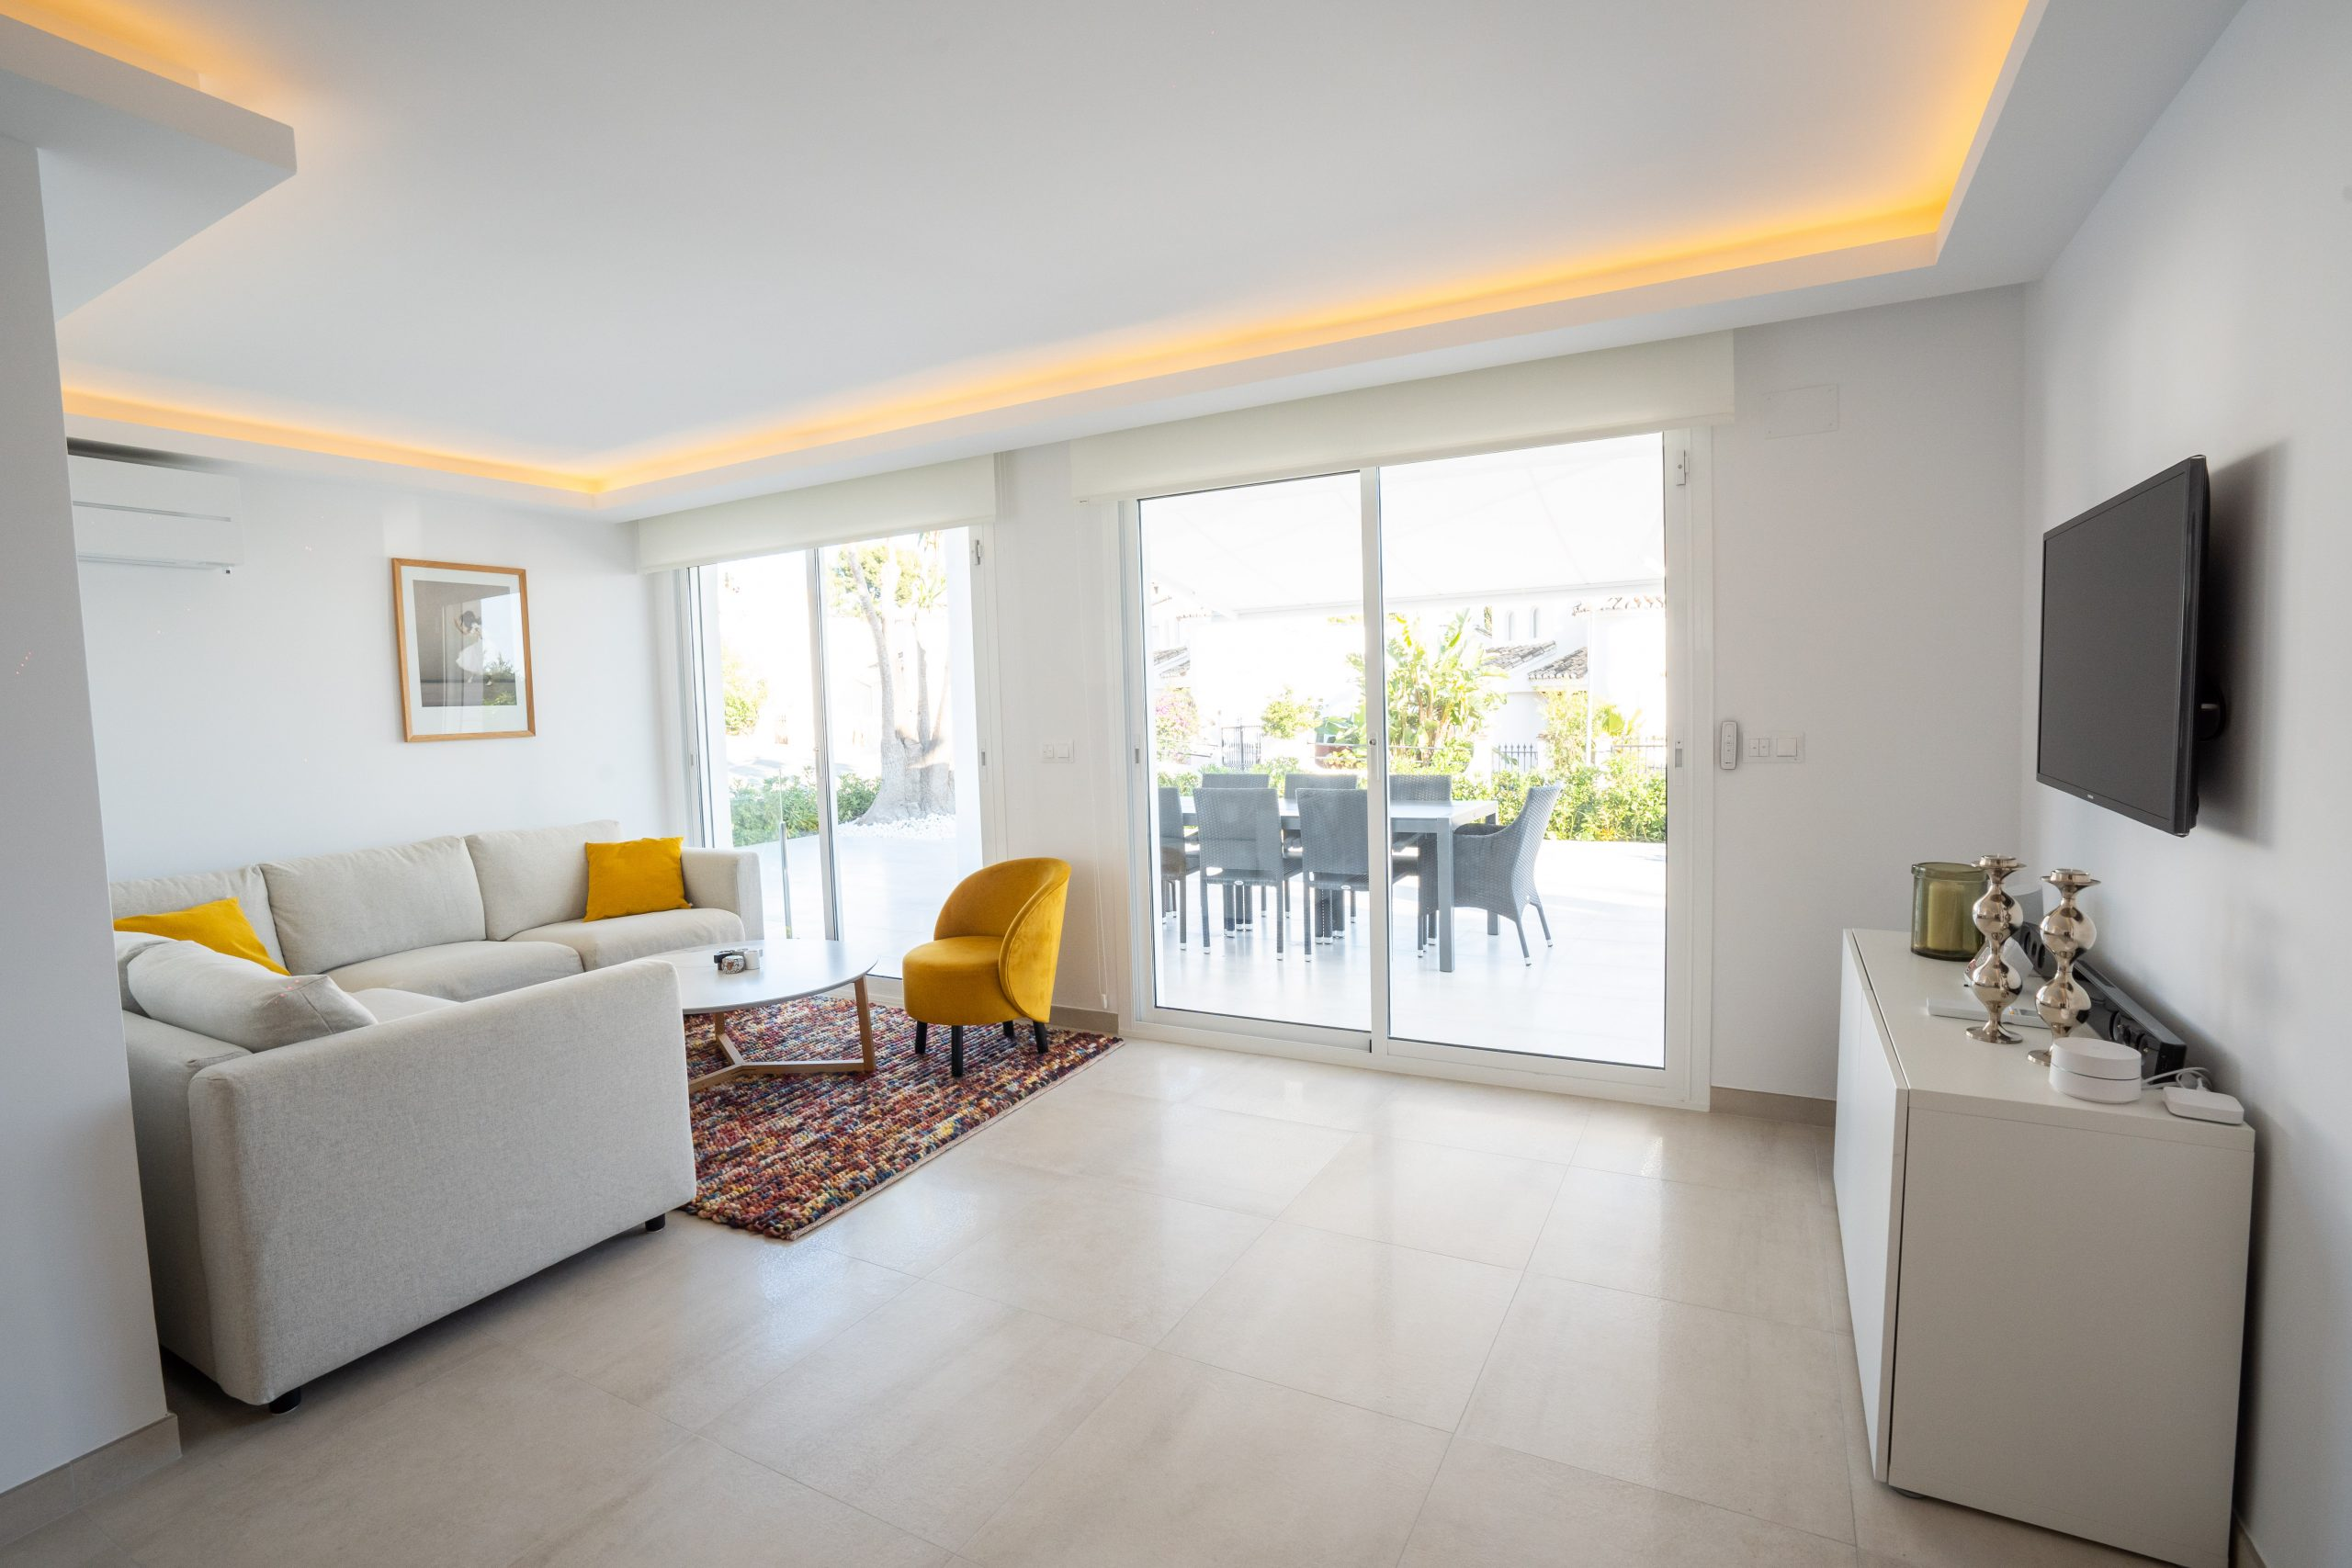 reforma salón villa con luminaria interior (3)